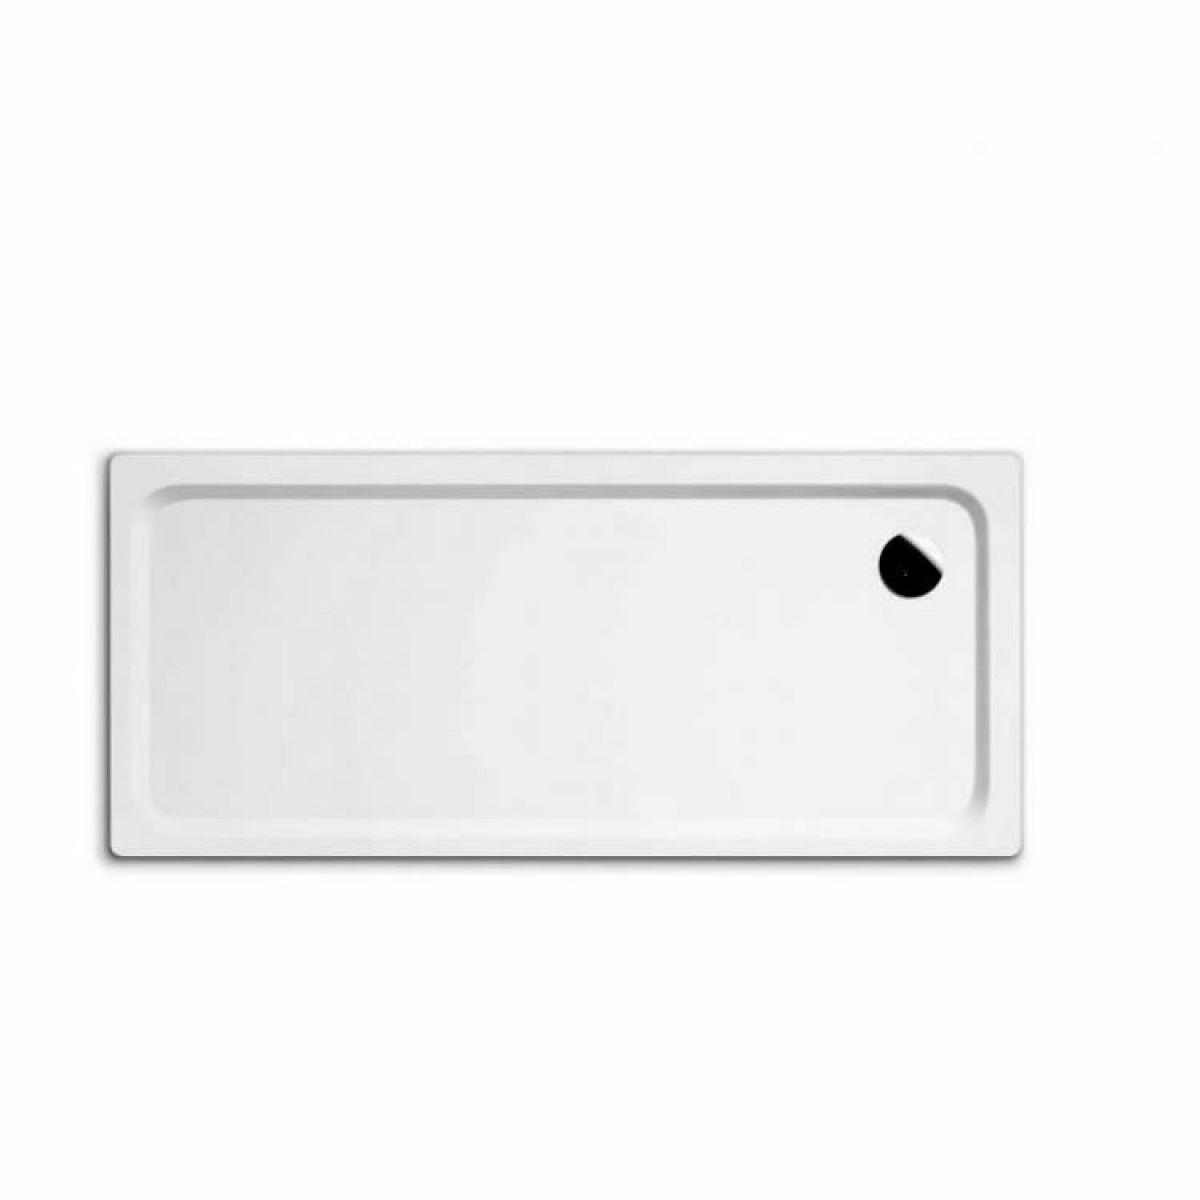 kaldewei superplan xxl steel shower tray uk bathrooms. Black Bedroom Furniture Sets. Home Design Ideas